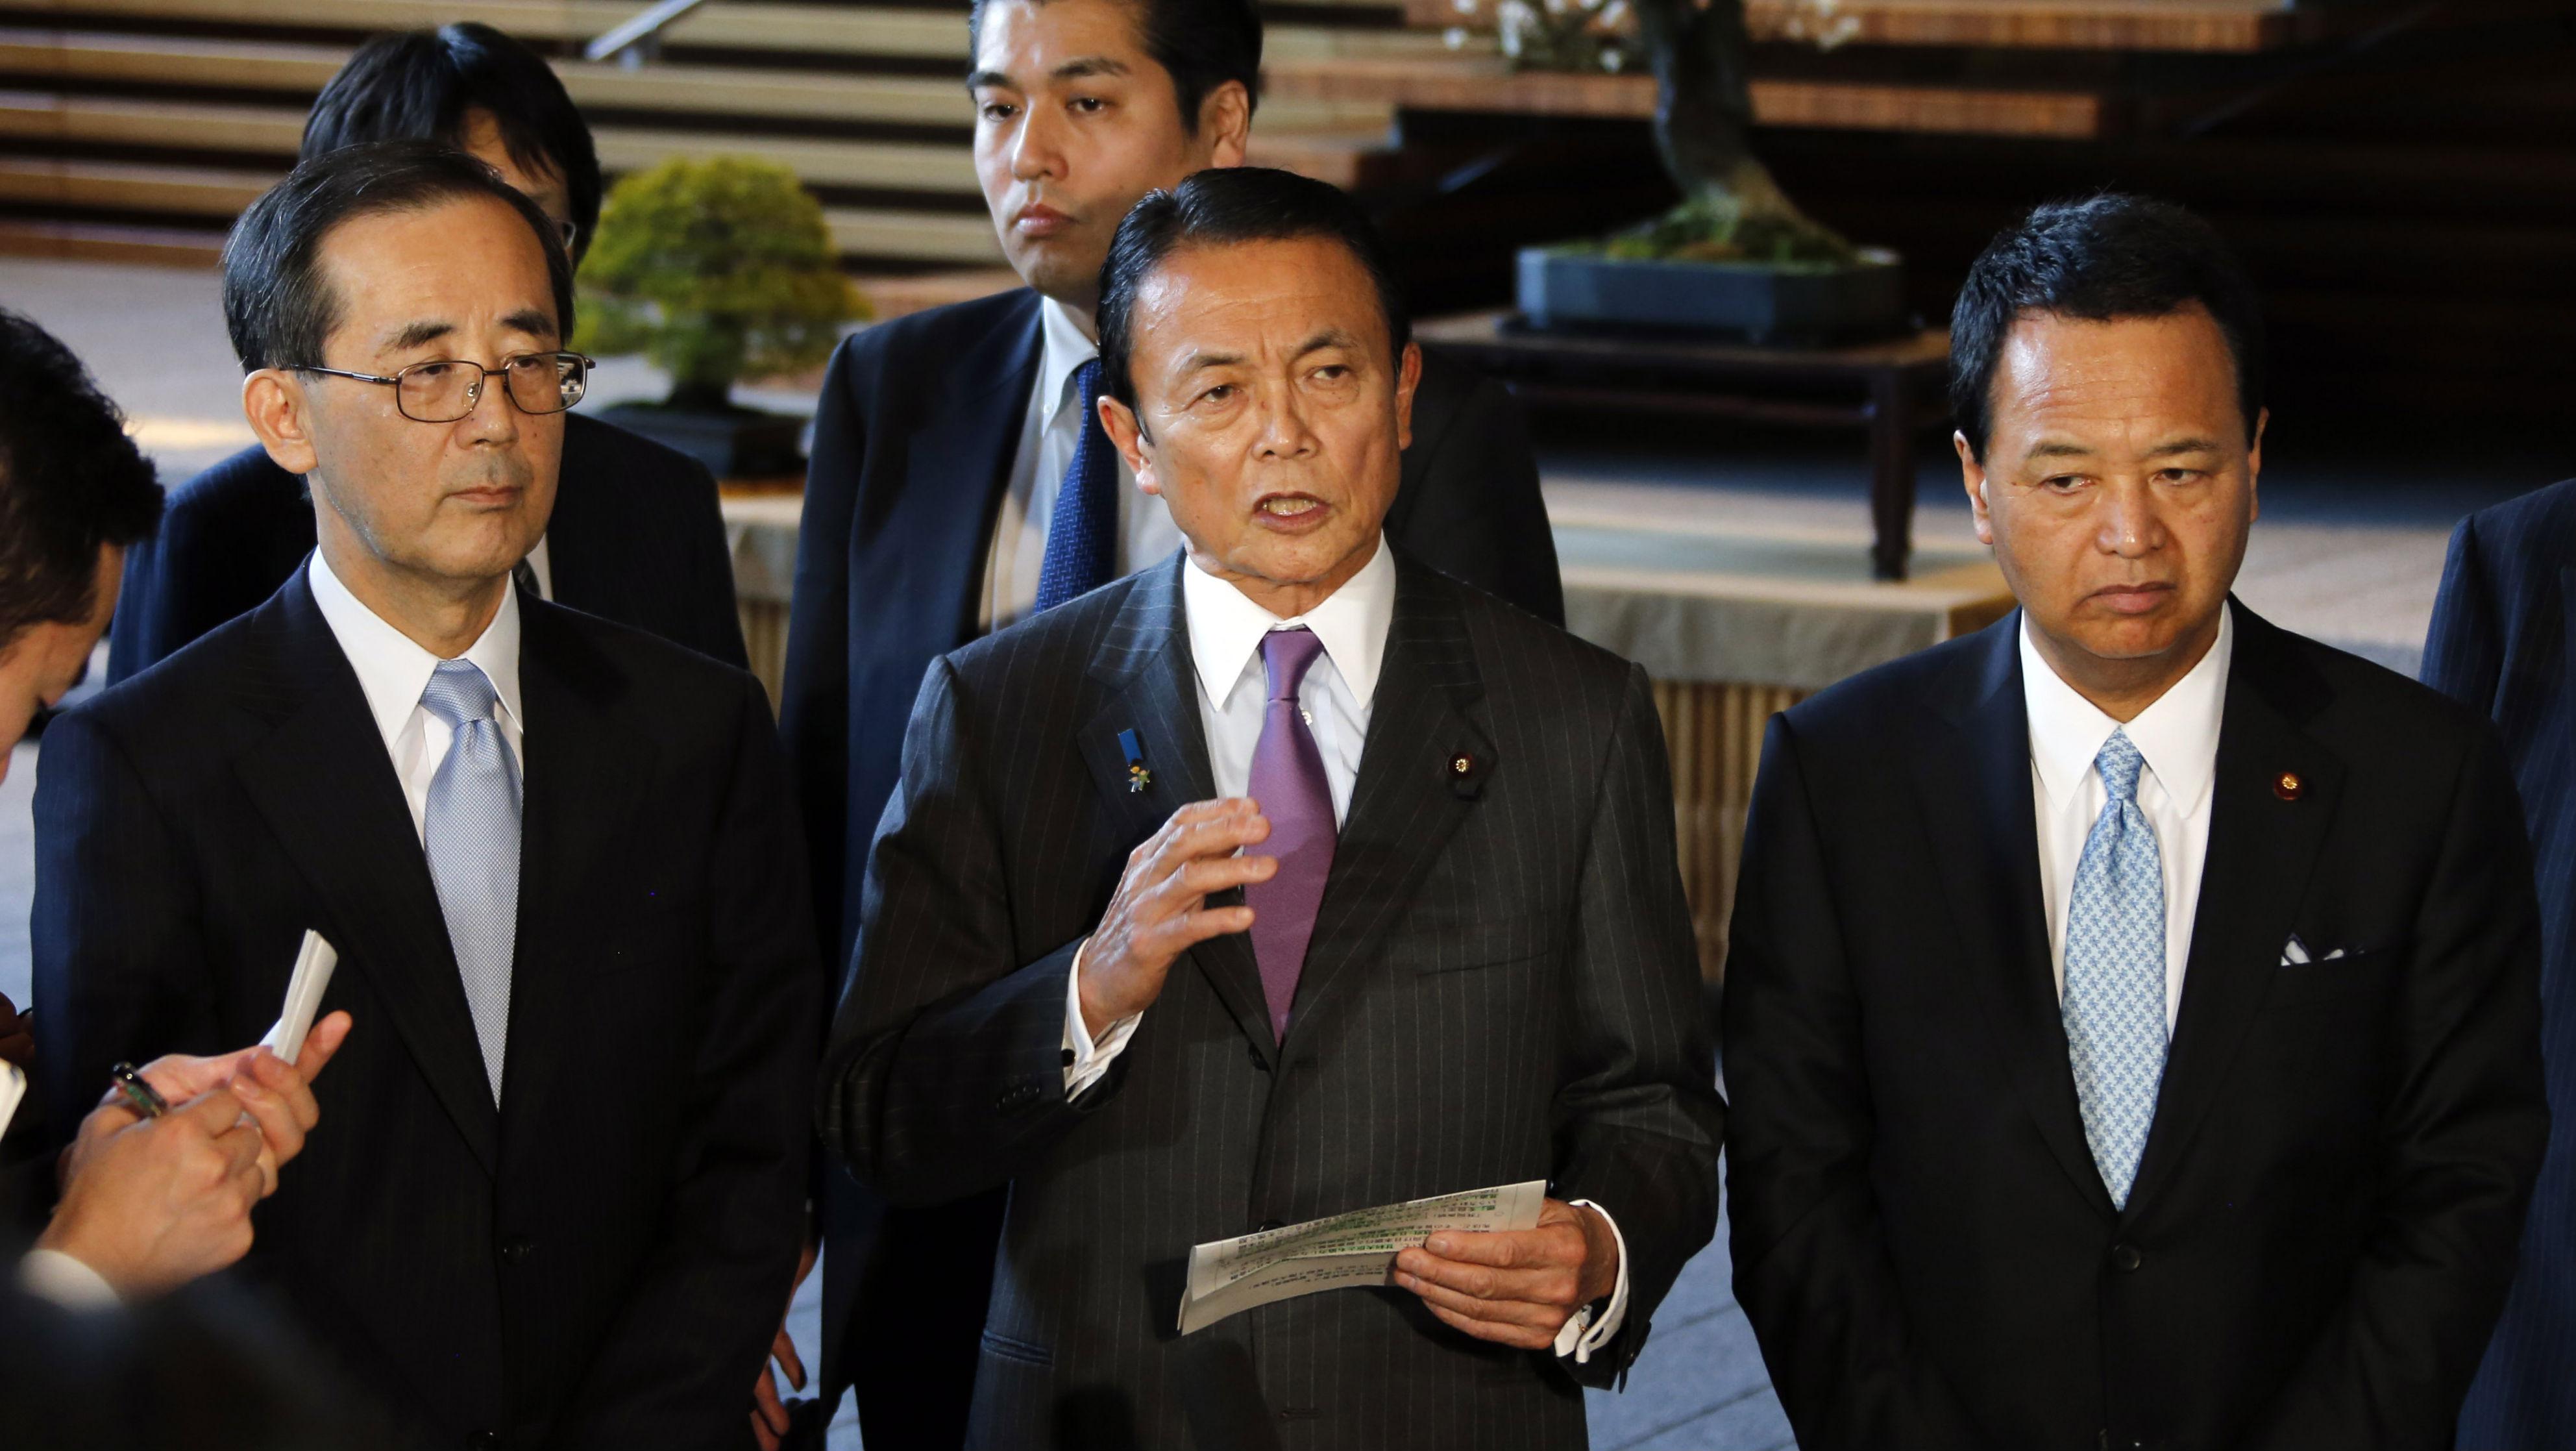 Not so radical: Japan's Finance Minister Taro Aso (center), along with Economics Minister Akira Amari (right) and Bank of Japan Gov. Masaaki Shirakawa (left)